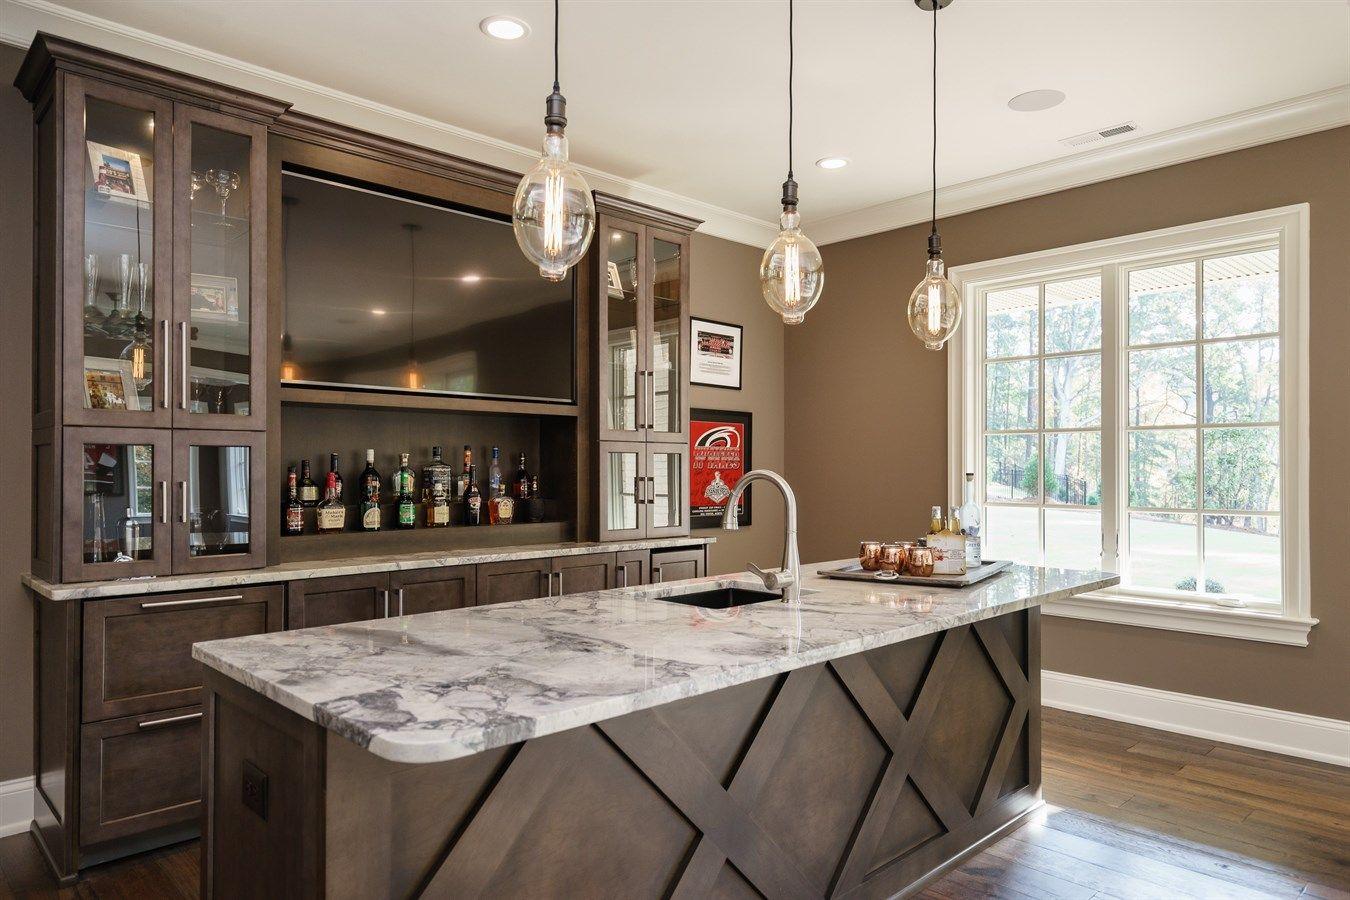 Wet Bar Basement Bar Designs Bars For Home Home Bar Designs